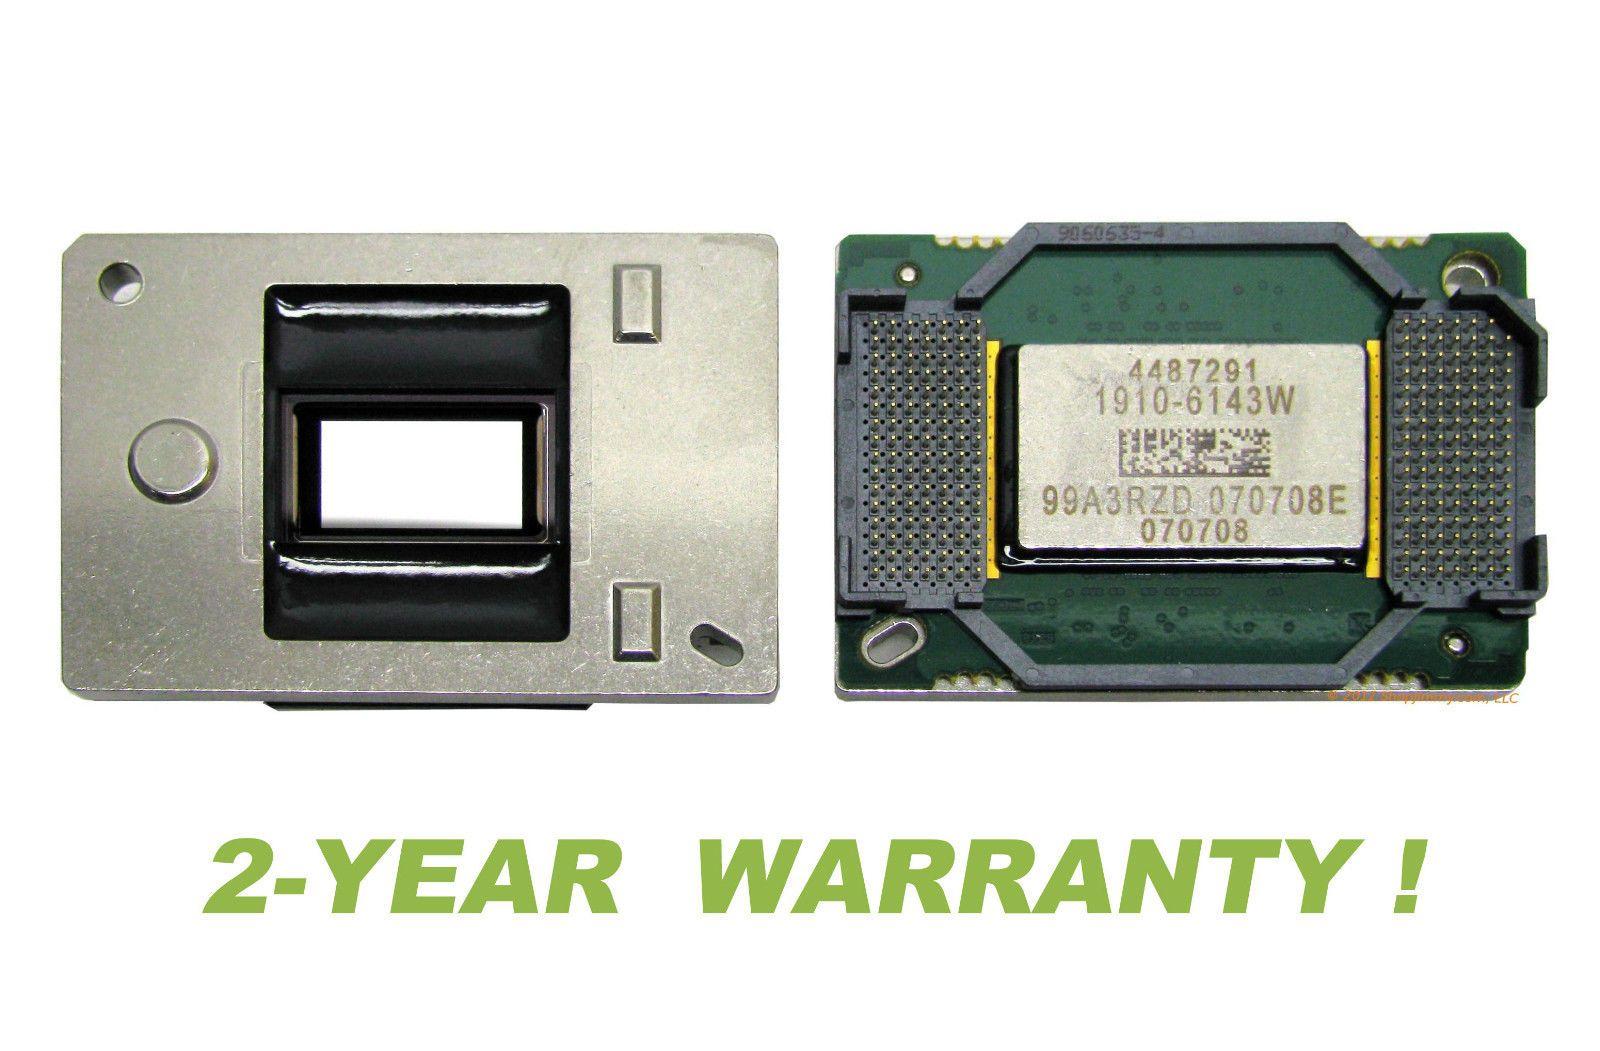 New Samsung Mitsubishi Toshiba 4719 001997 Dlp Chip With 2 Year Warranty Samsung Electronics Samsung Warranty